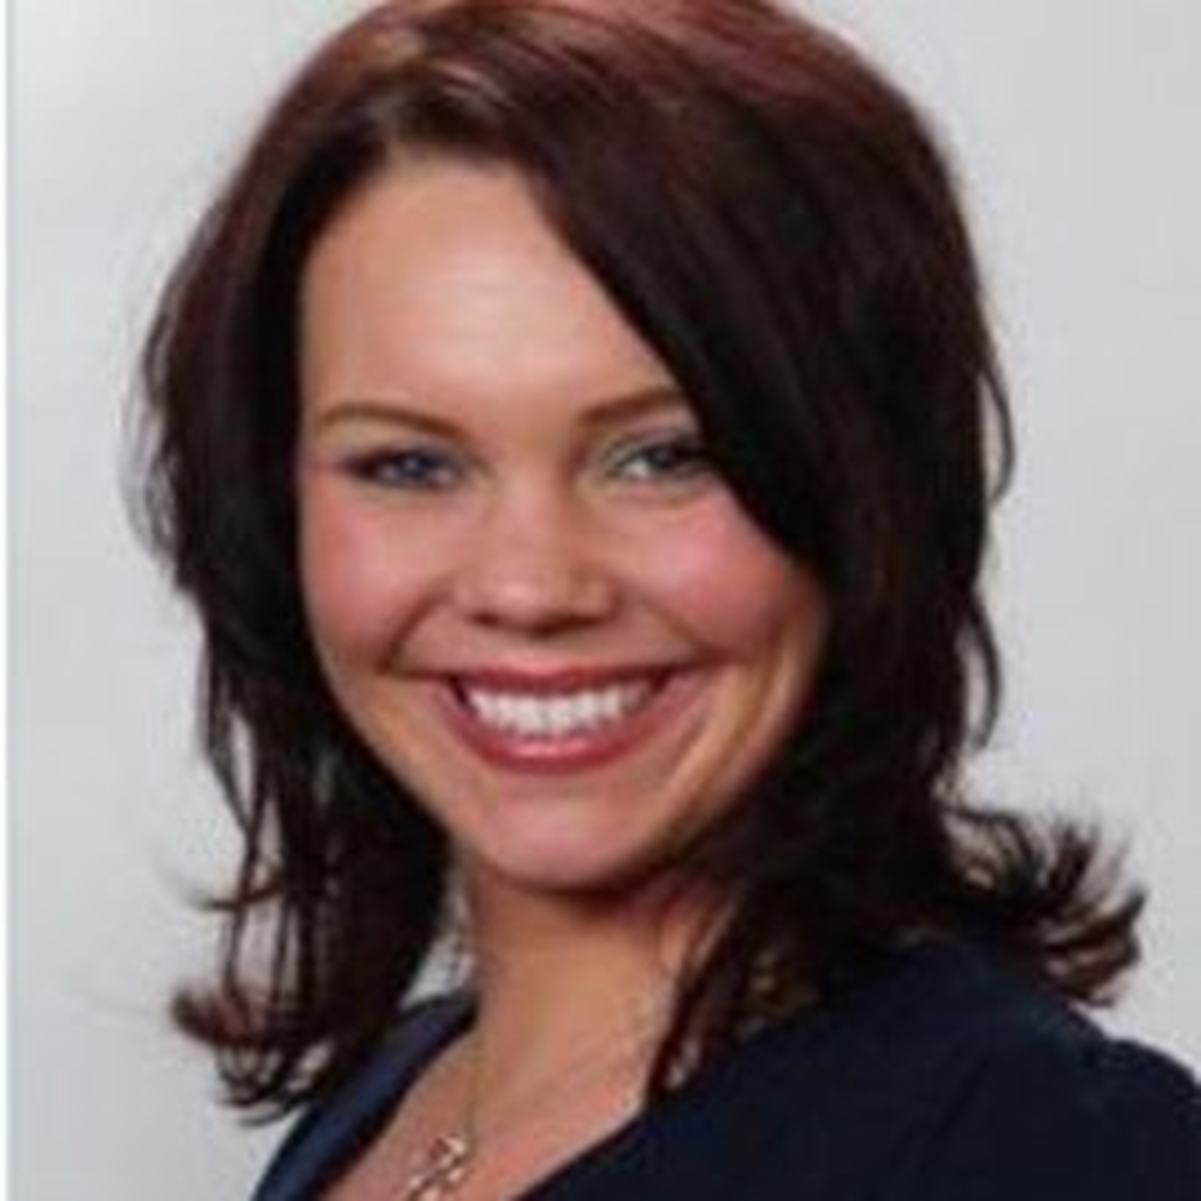 Stacy Nadeau